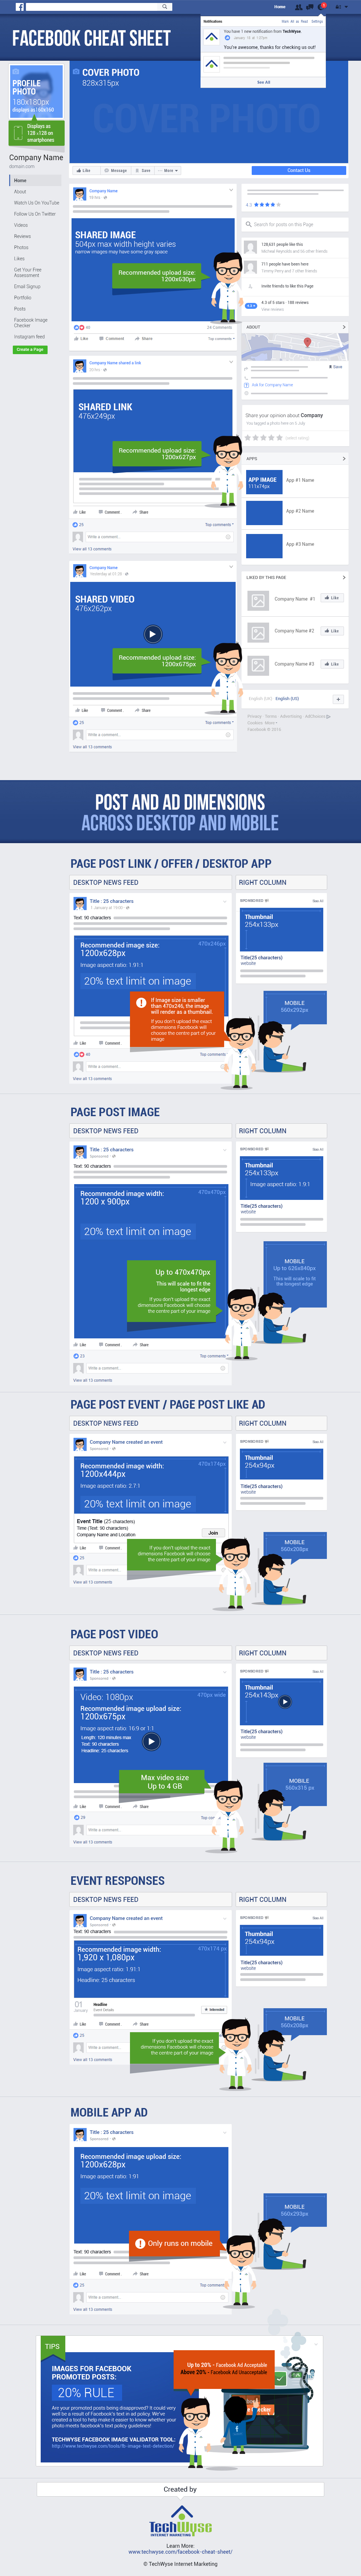 Facebook Image Cheatsheet [Infographic]